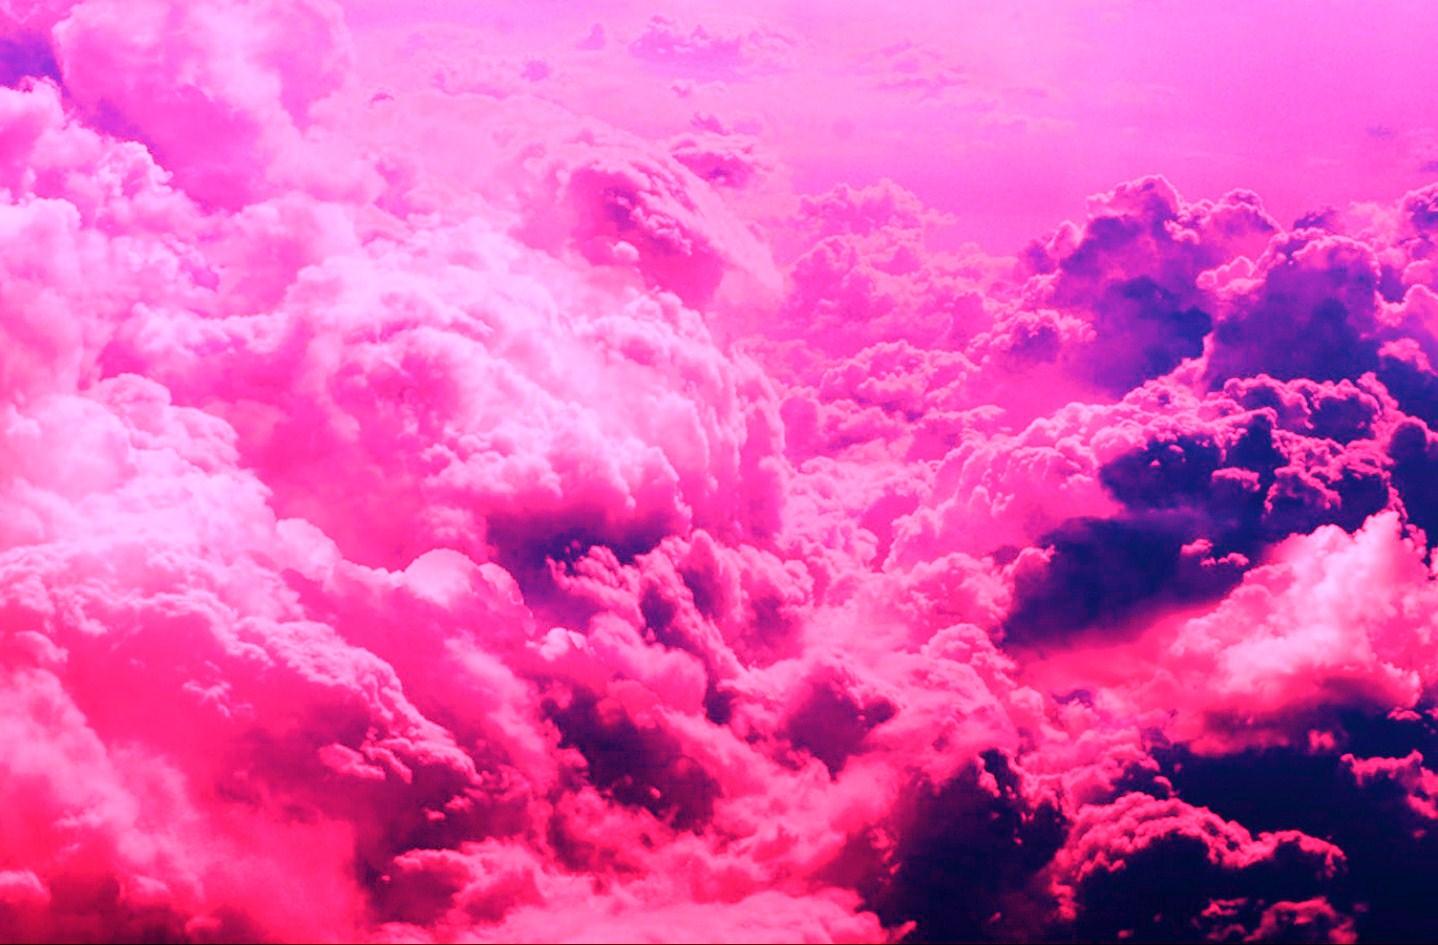 Ipad Wallpaper Hd 31 Wallpapers: Pink IPad Wallpaper